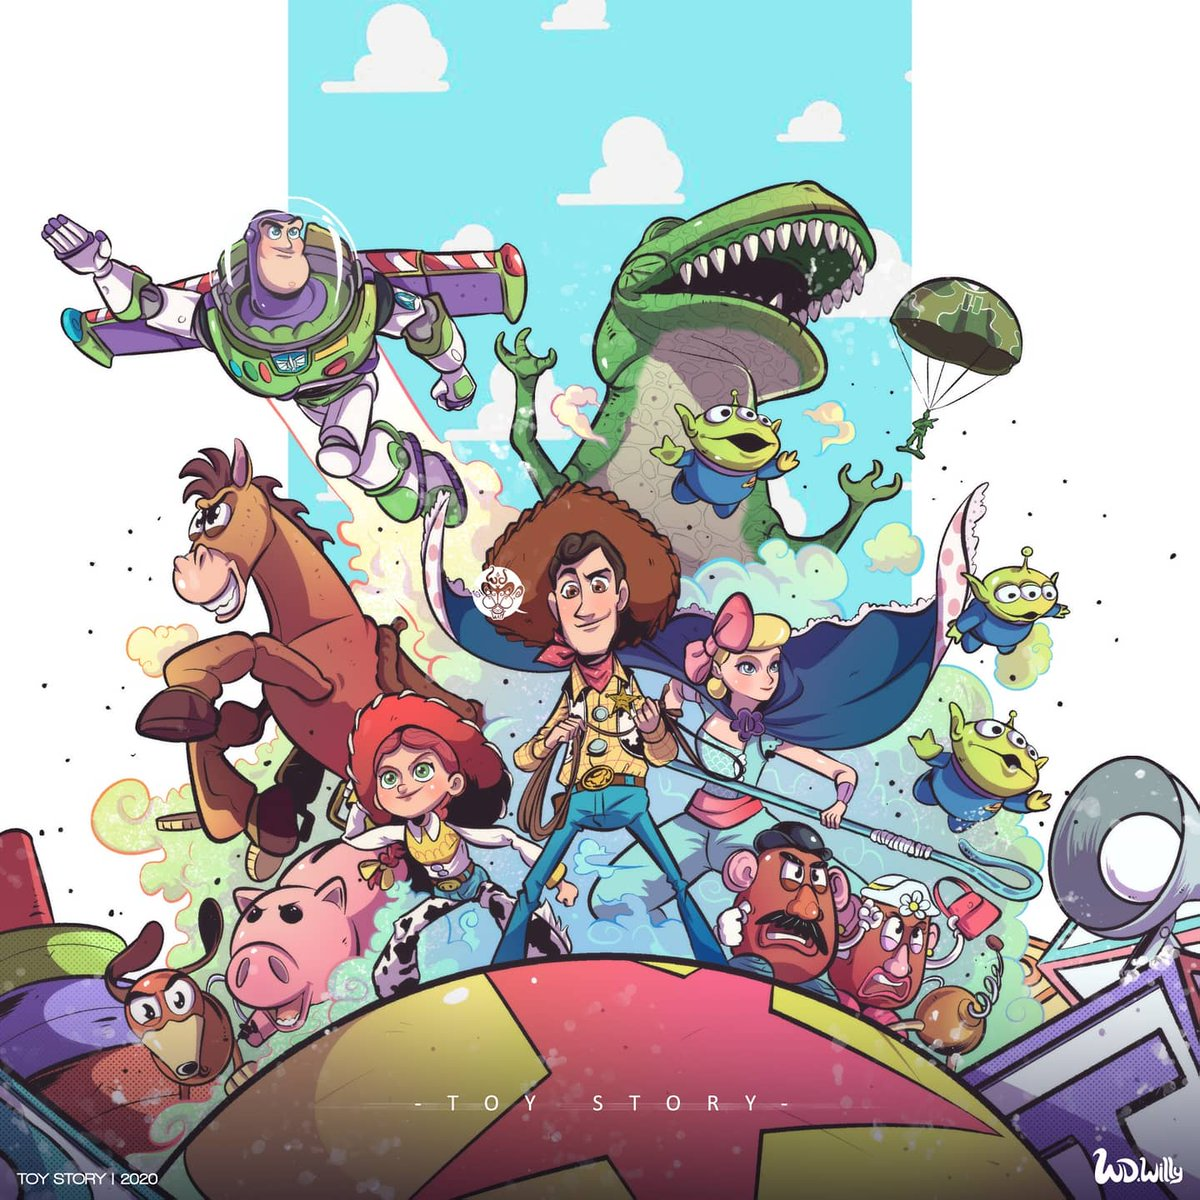 Happy 25th Anniversary to Toy Story. 💫  . *Tepatnya si kemarin 23 Nov, cuman baru kelar di finishing gambarnya. 😁 Btw, ini salah satu Film yang bikin aku pengen koleksi banyak toys ✨✨ . @toystory @Pixar #toystory #ToyStory25 #toystorycollection #Woody #buzzlightyear